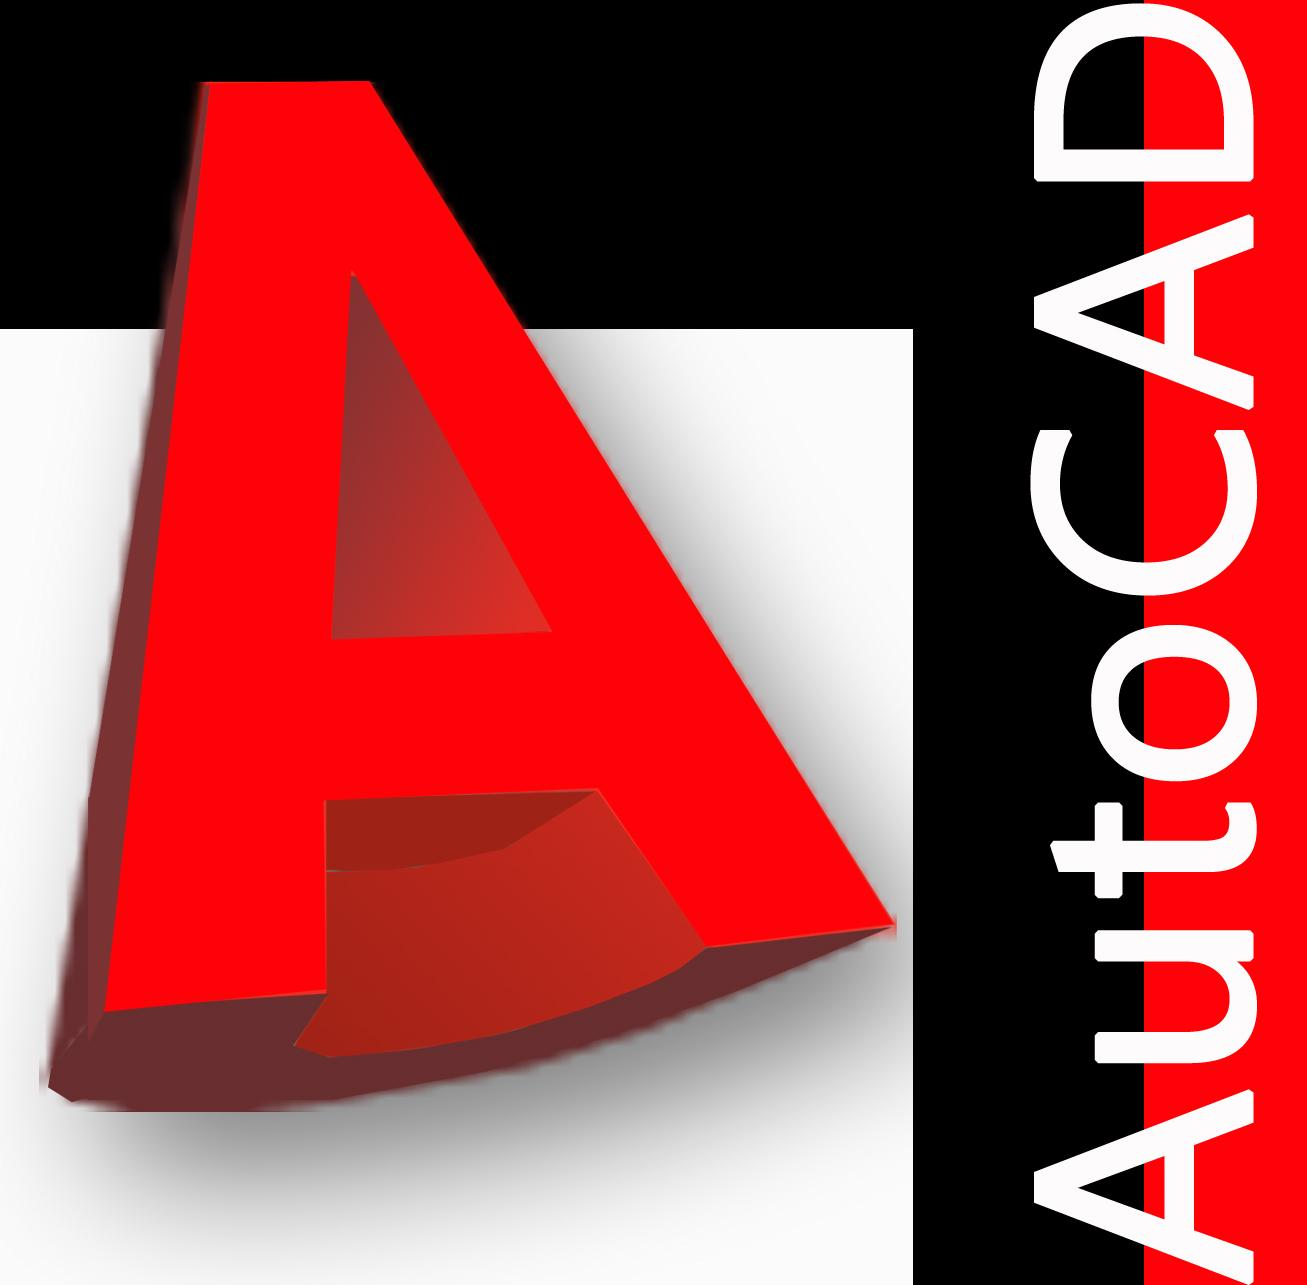 Logo Autocad PNG - 98151